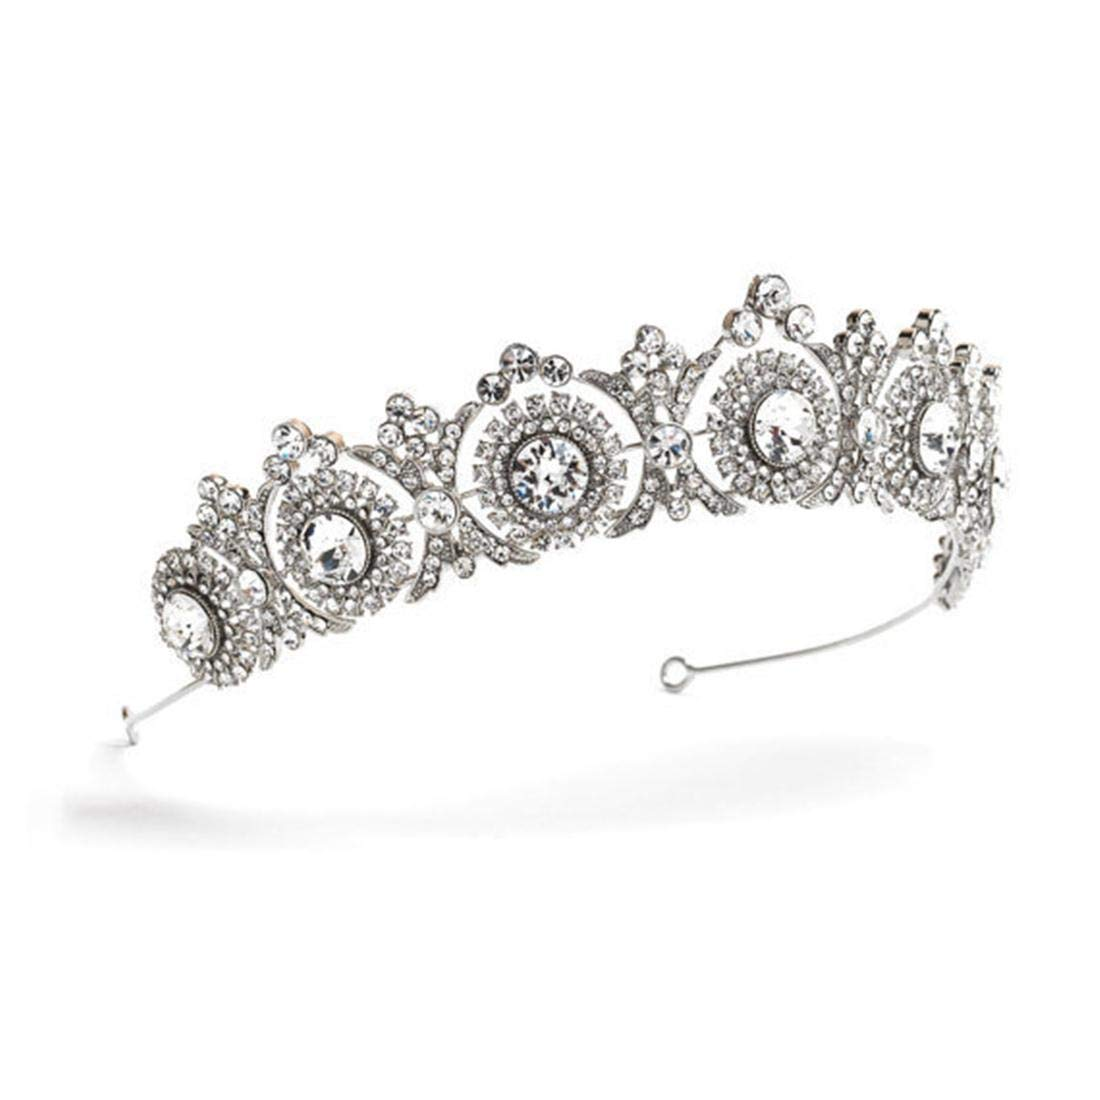 JIAJ Hair Rhinestone Crown Bridal Headwear Headband Princess Birthday Party Crown Bridal Jewelry (Color : Silver) by JIAJ